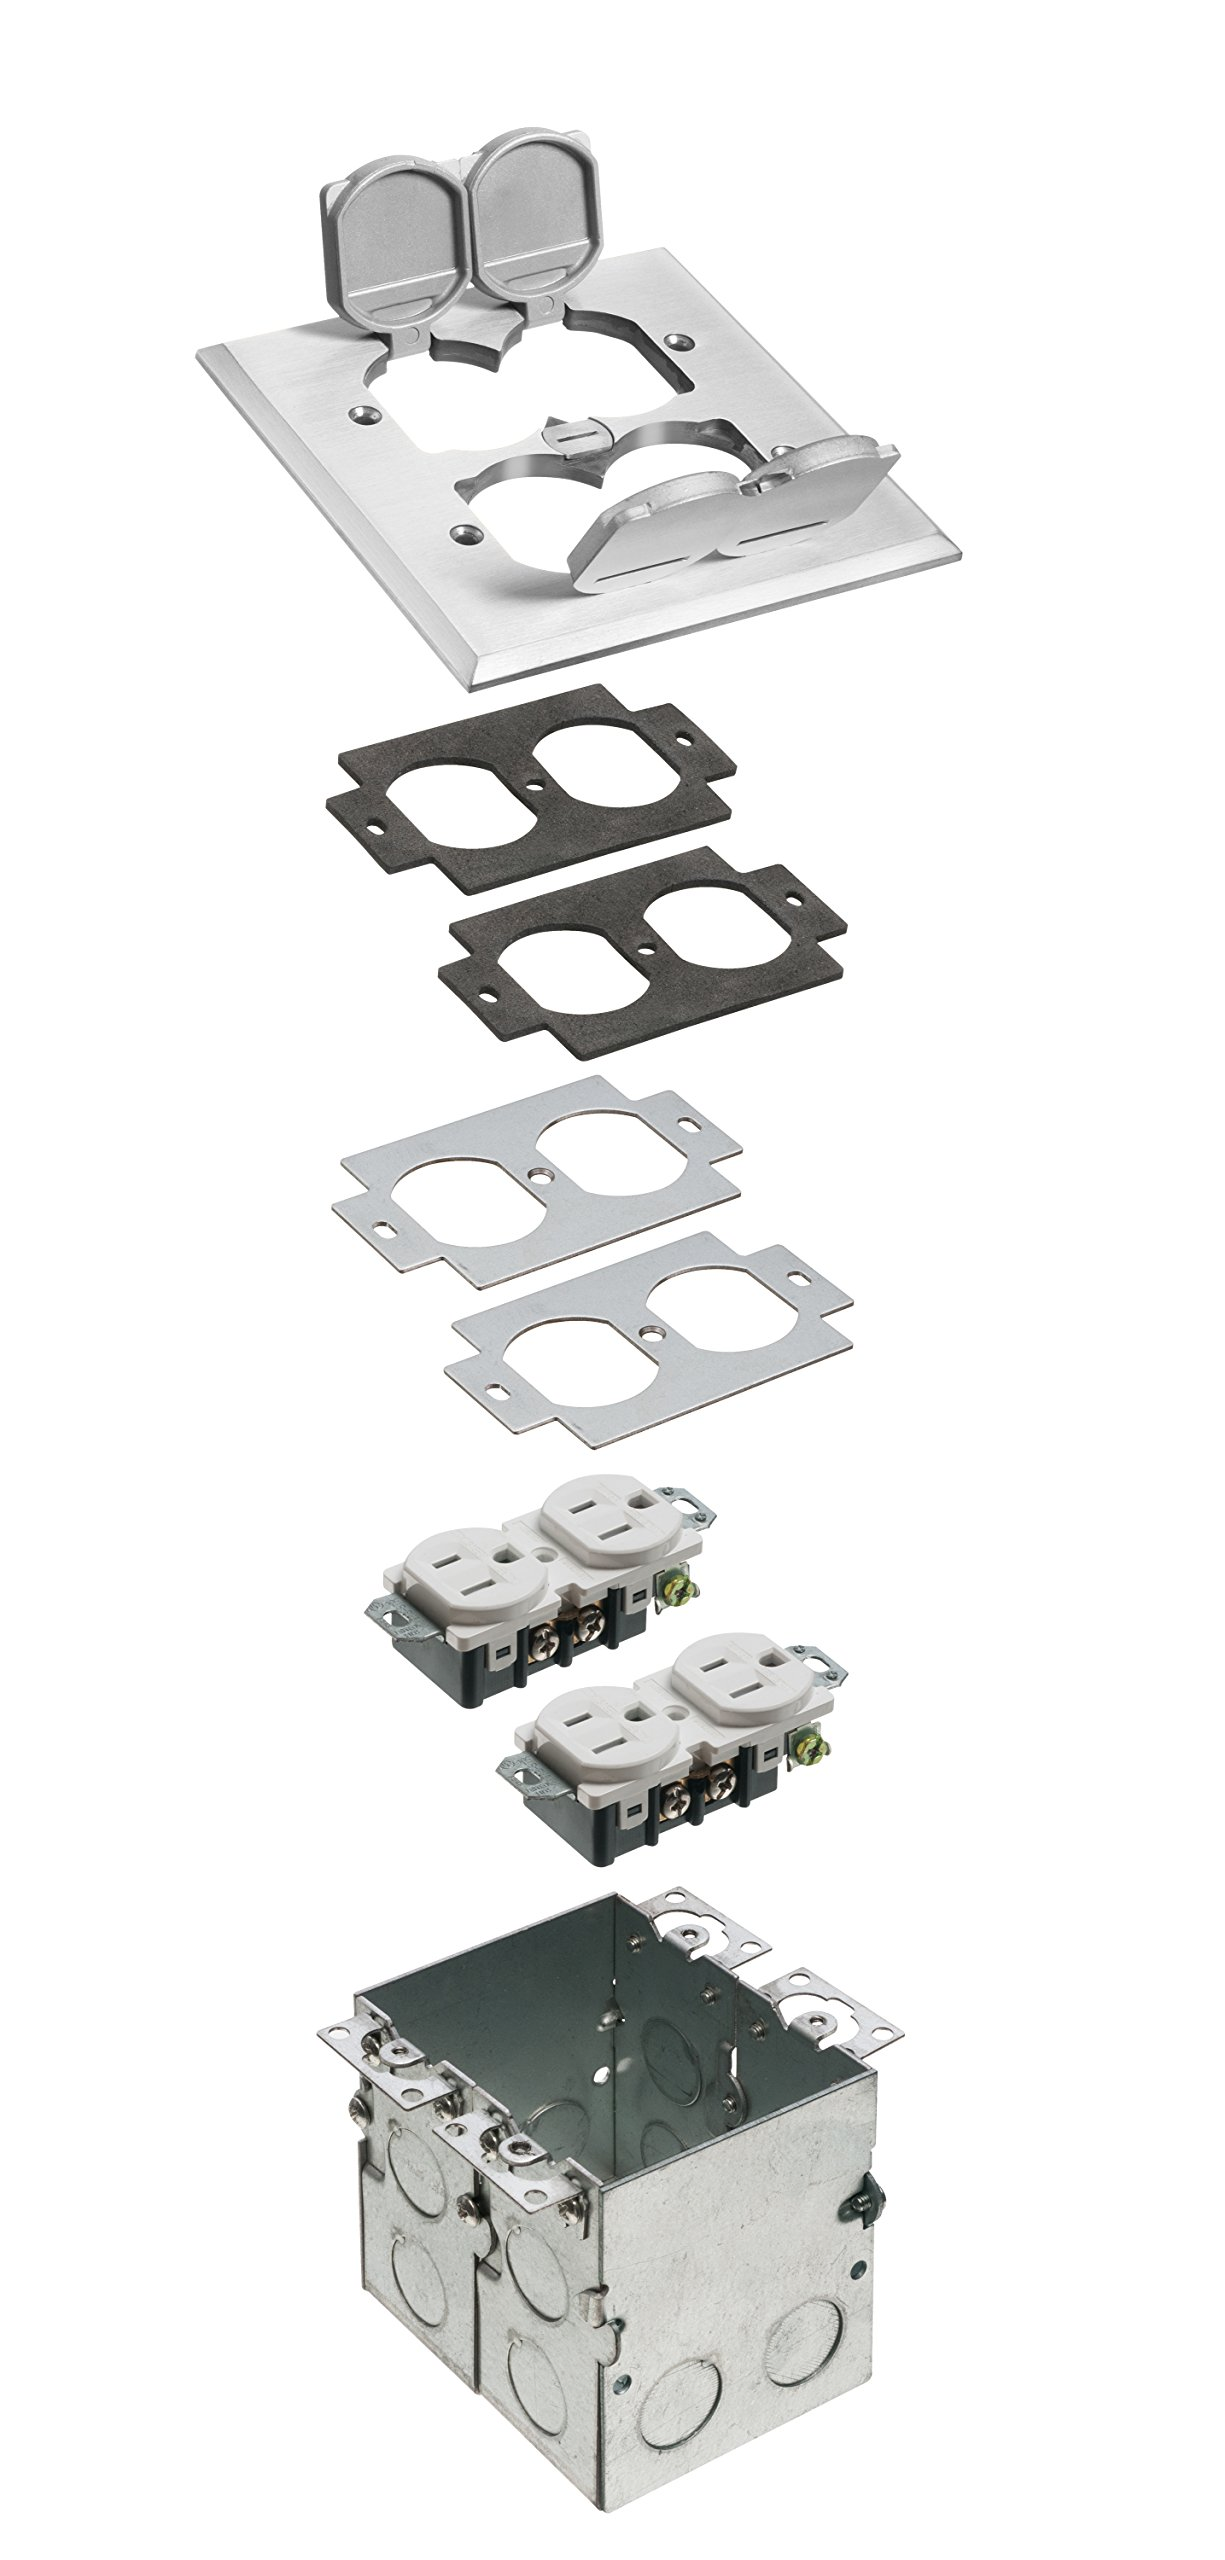 Arlington Industries FLB5551NL-1 Steel Floor Box Kit with Metal Cover and 4-Flip Lids, 2-Gang, Nickel-Plated, 1-Pack